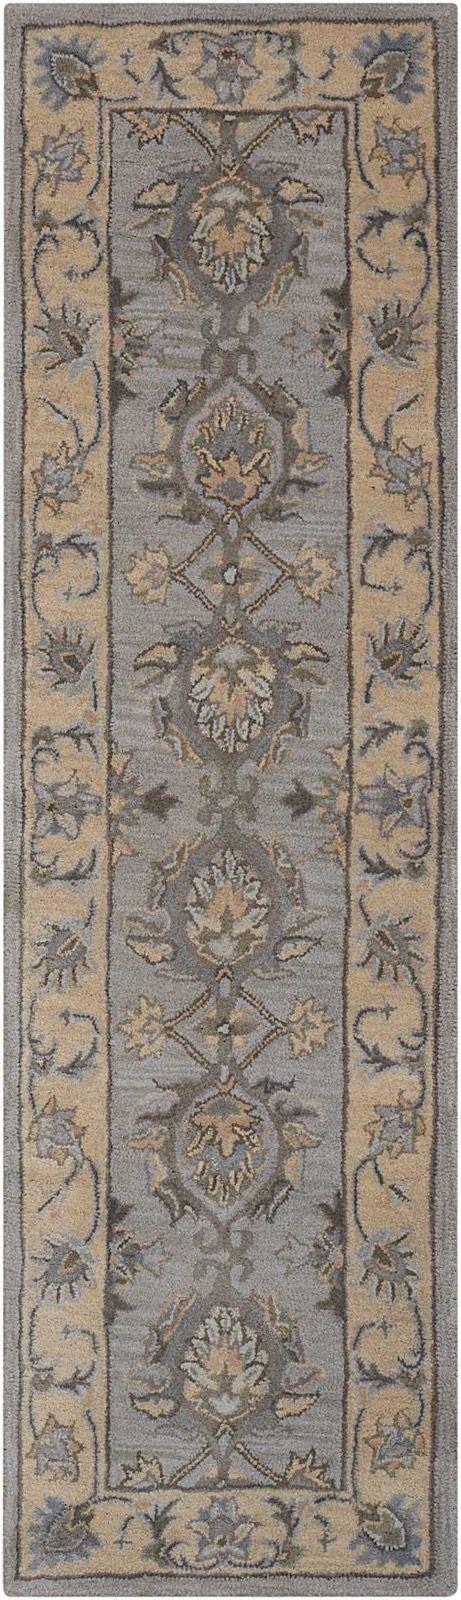 nourison joa11 sepia traditional area rug collection